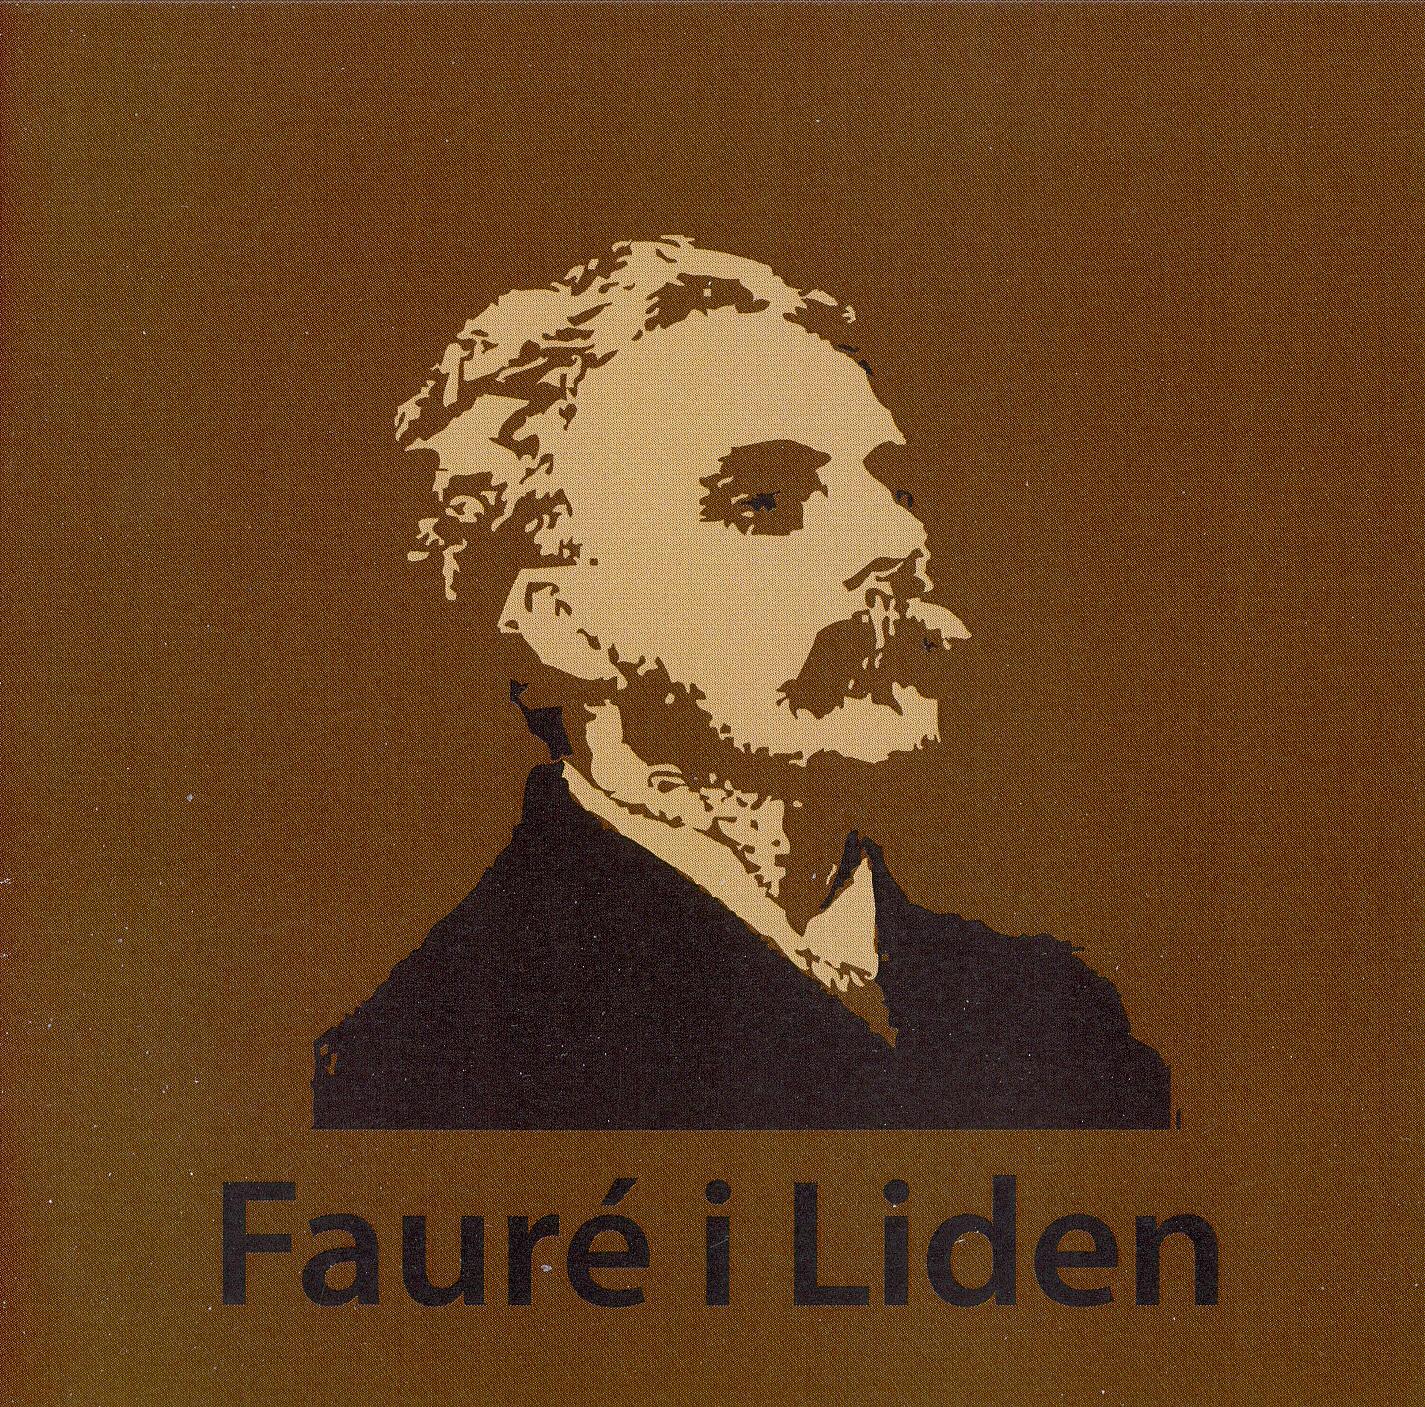 Fauré i Liden